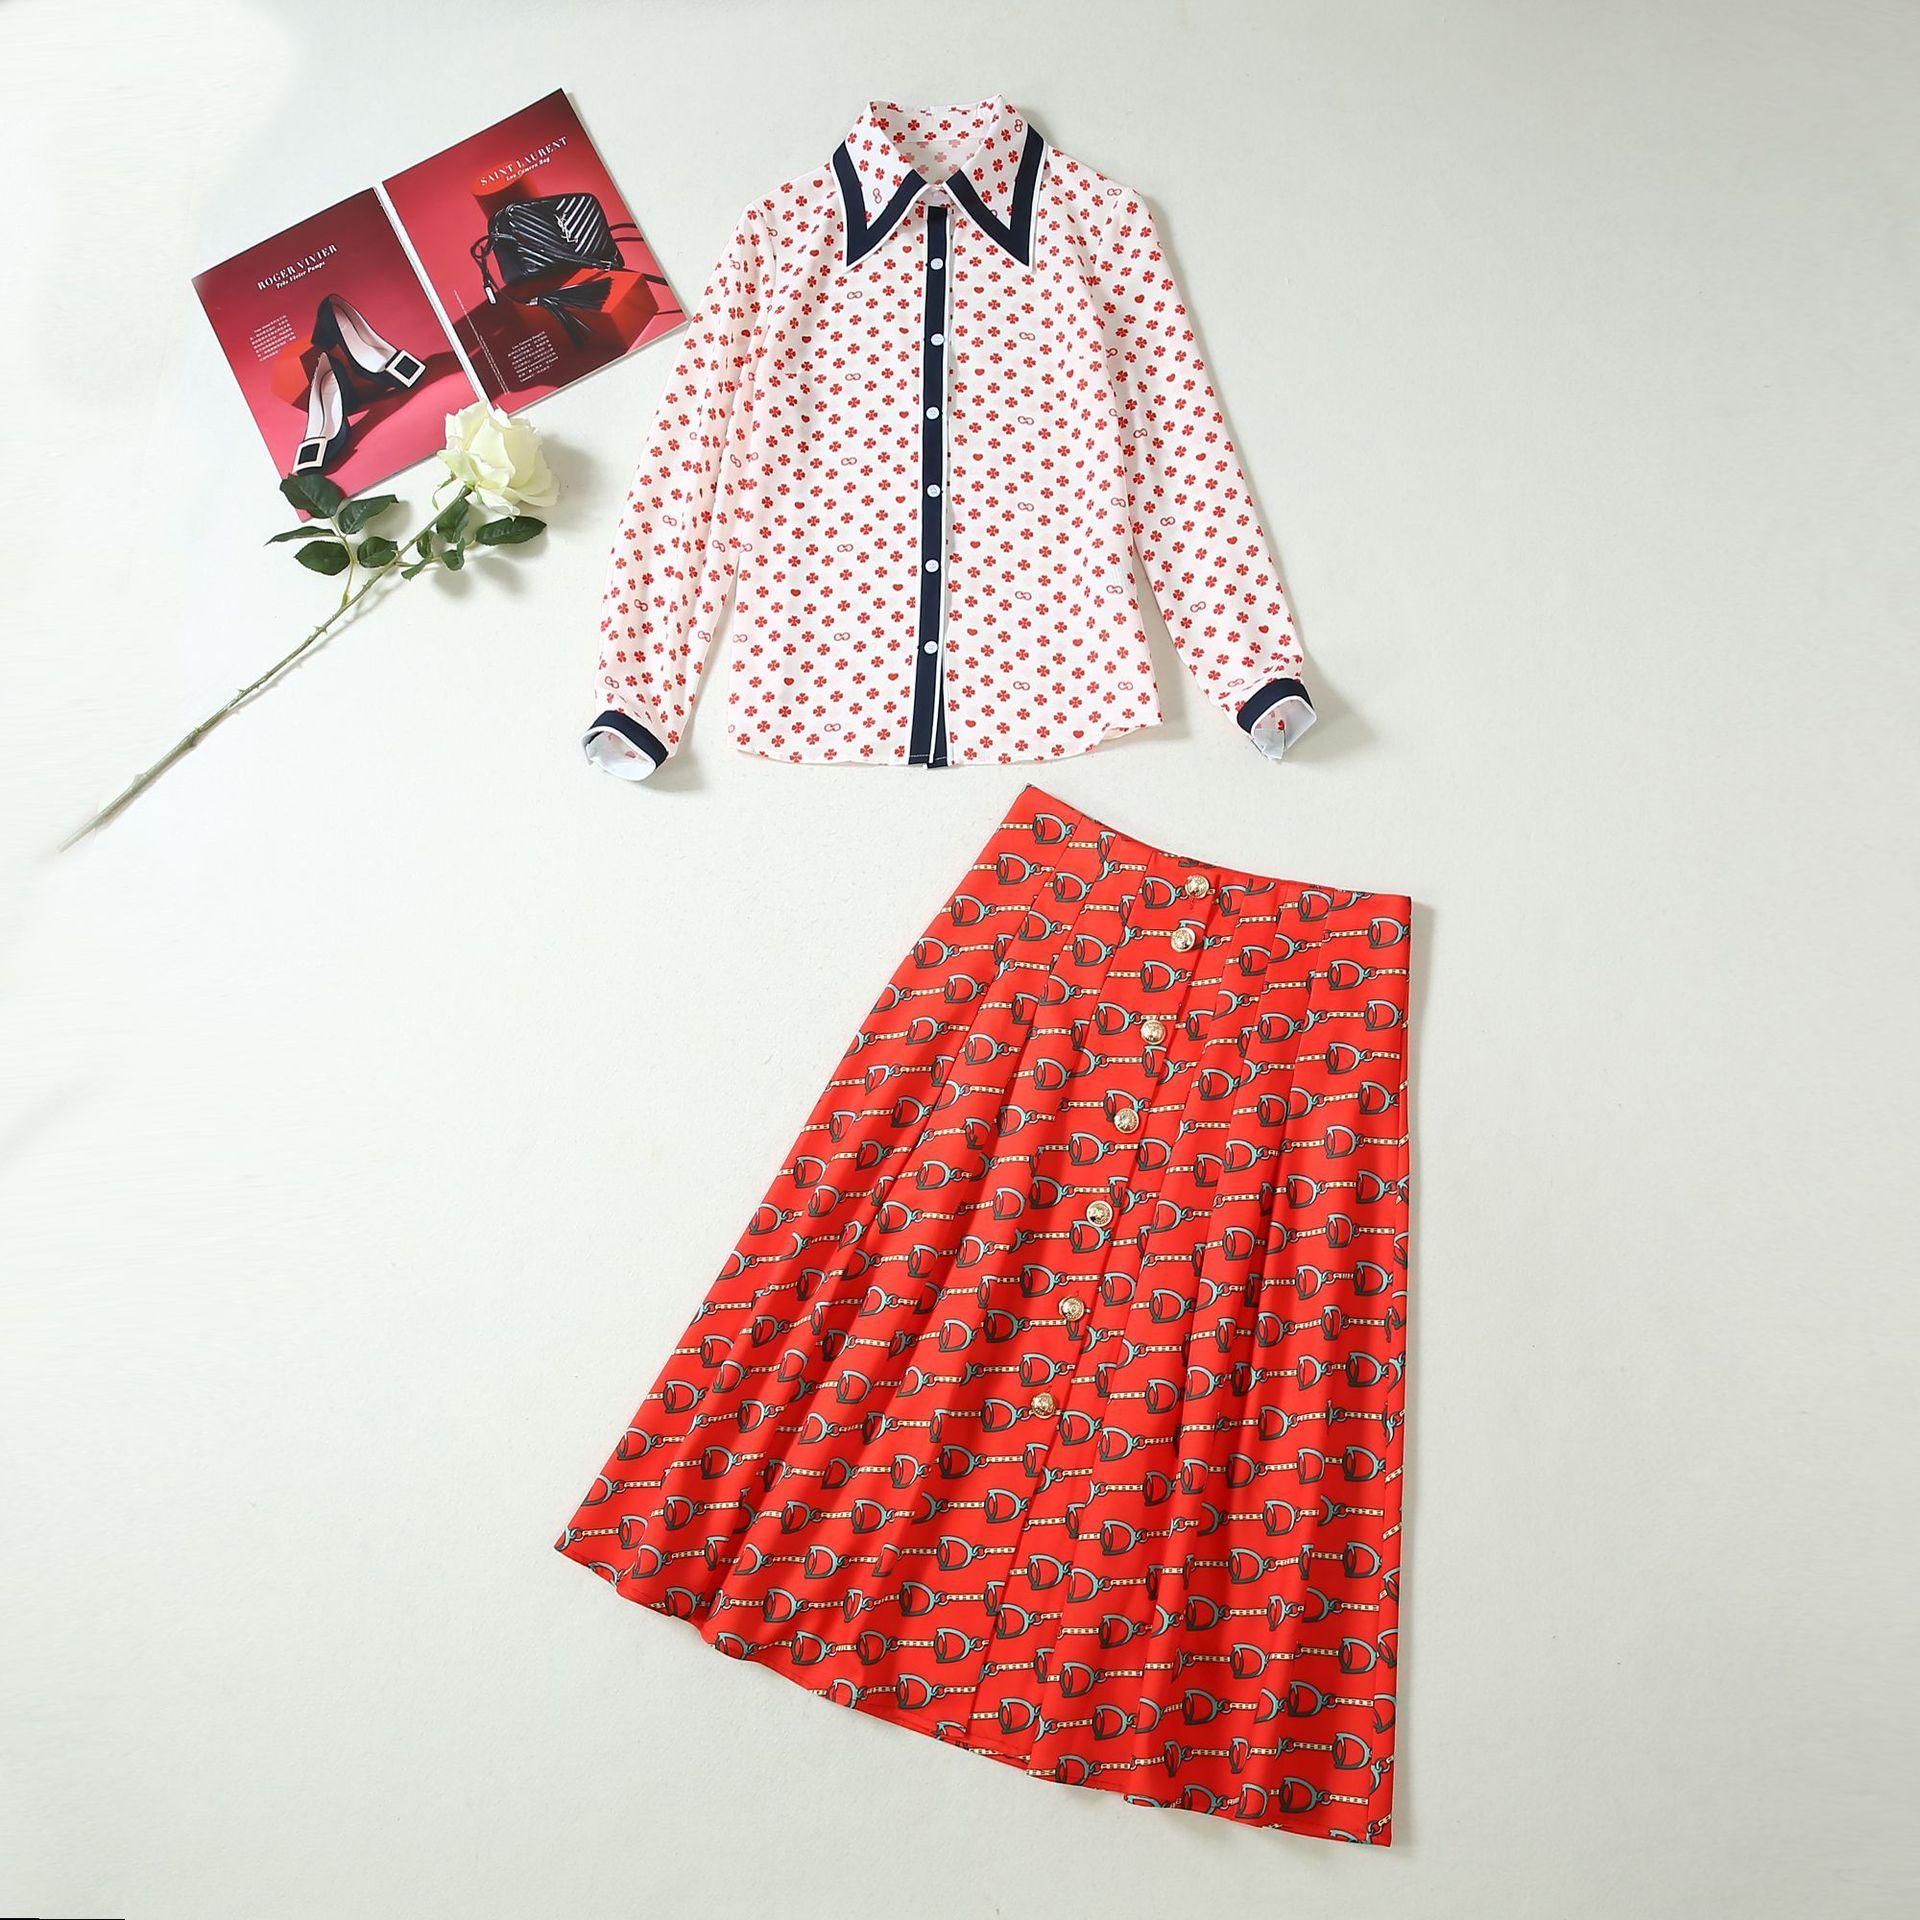 2019 Summer Fall Short Sleeve Turn-Down Collar Fashion Print Blouse + Mid-Calf Skirt Runway Two Piece 2 Pieces Set JL2419A2-7